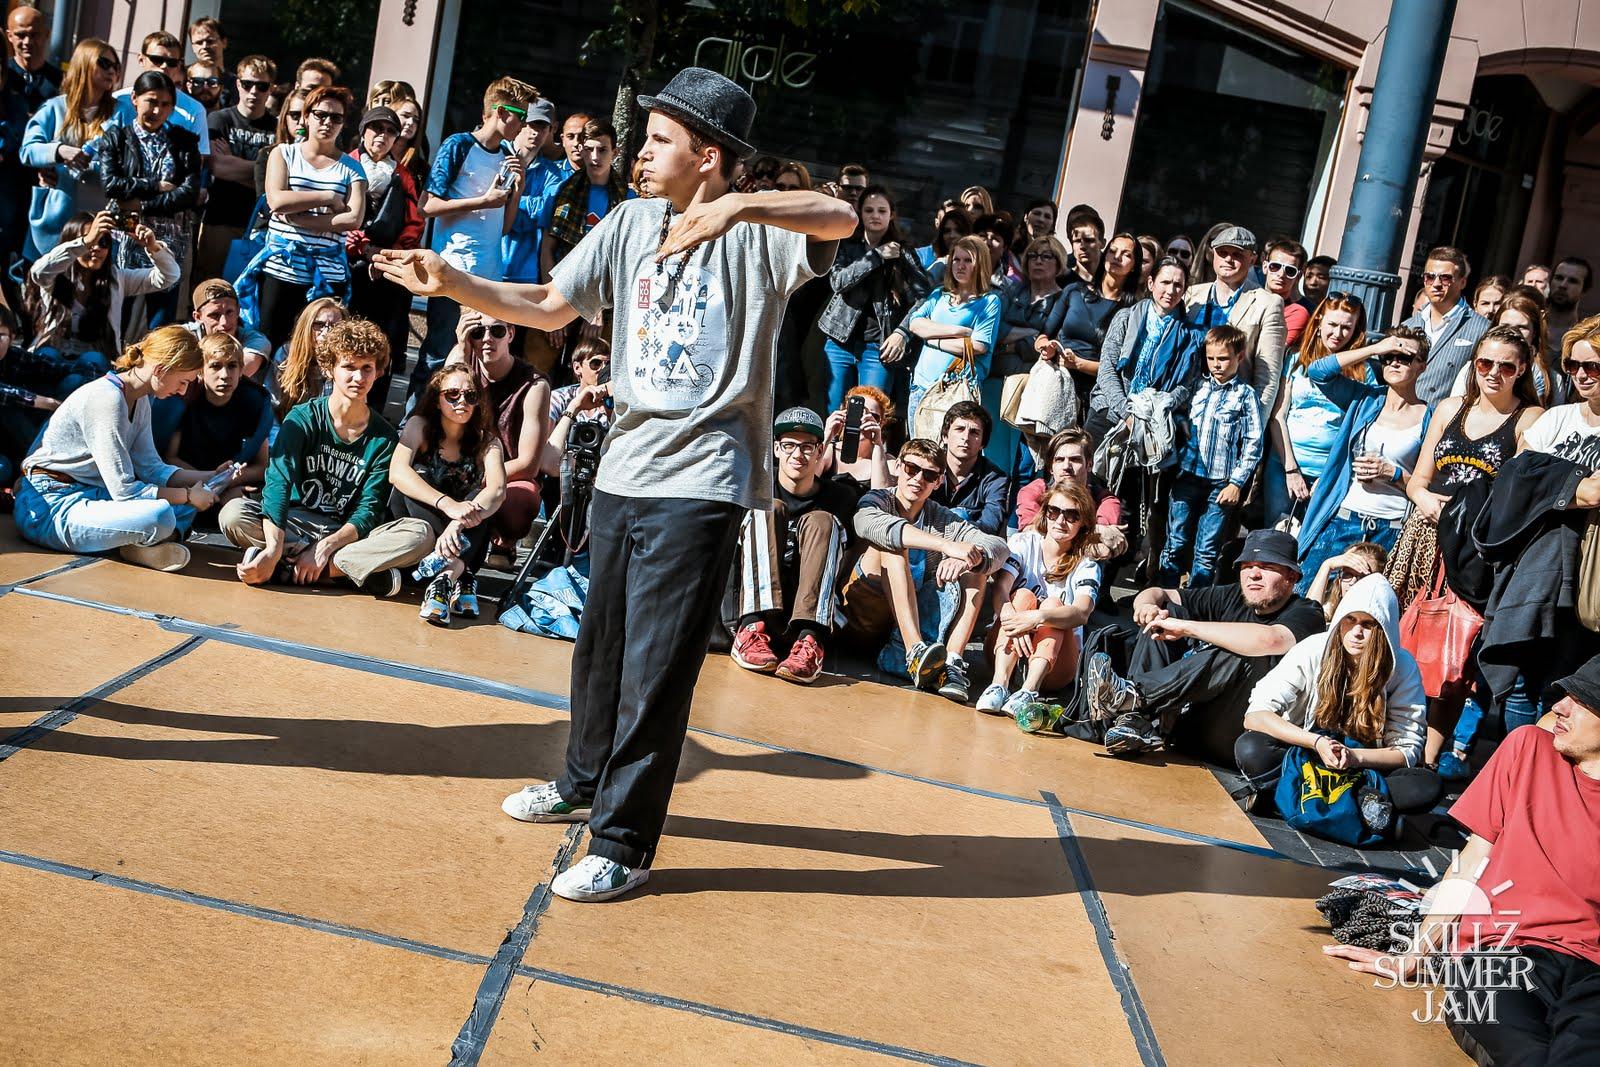 SKILLZ Summer Jam 2015 - xIMG_0352.jpg